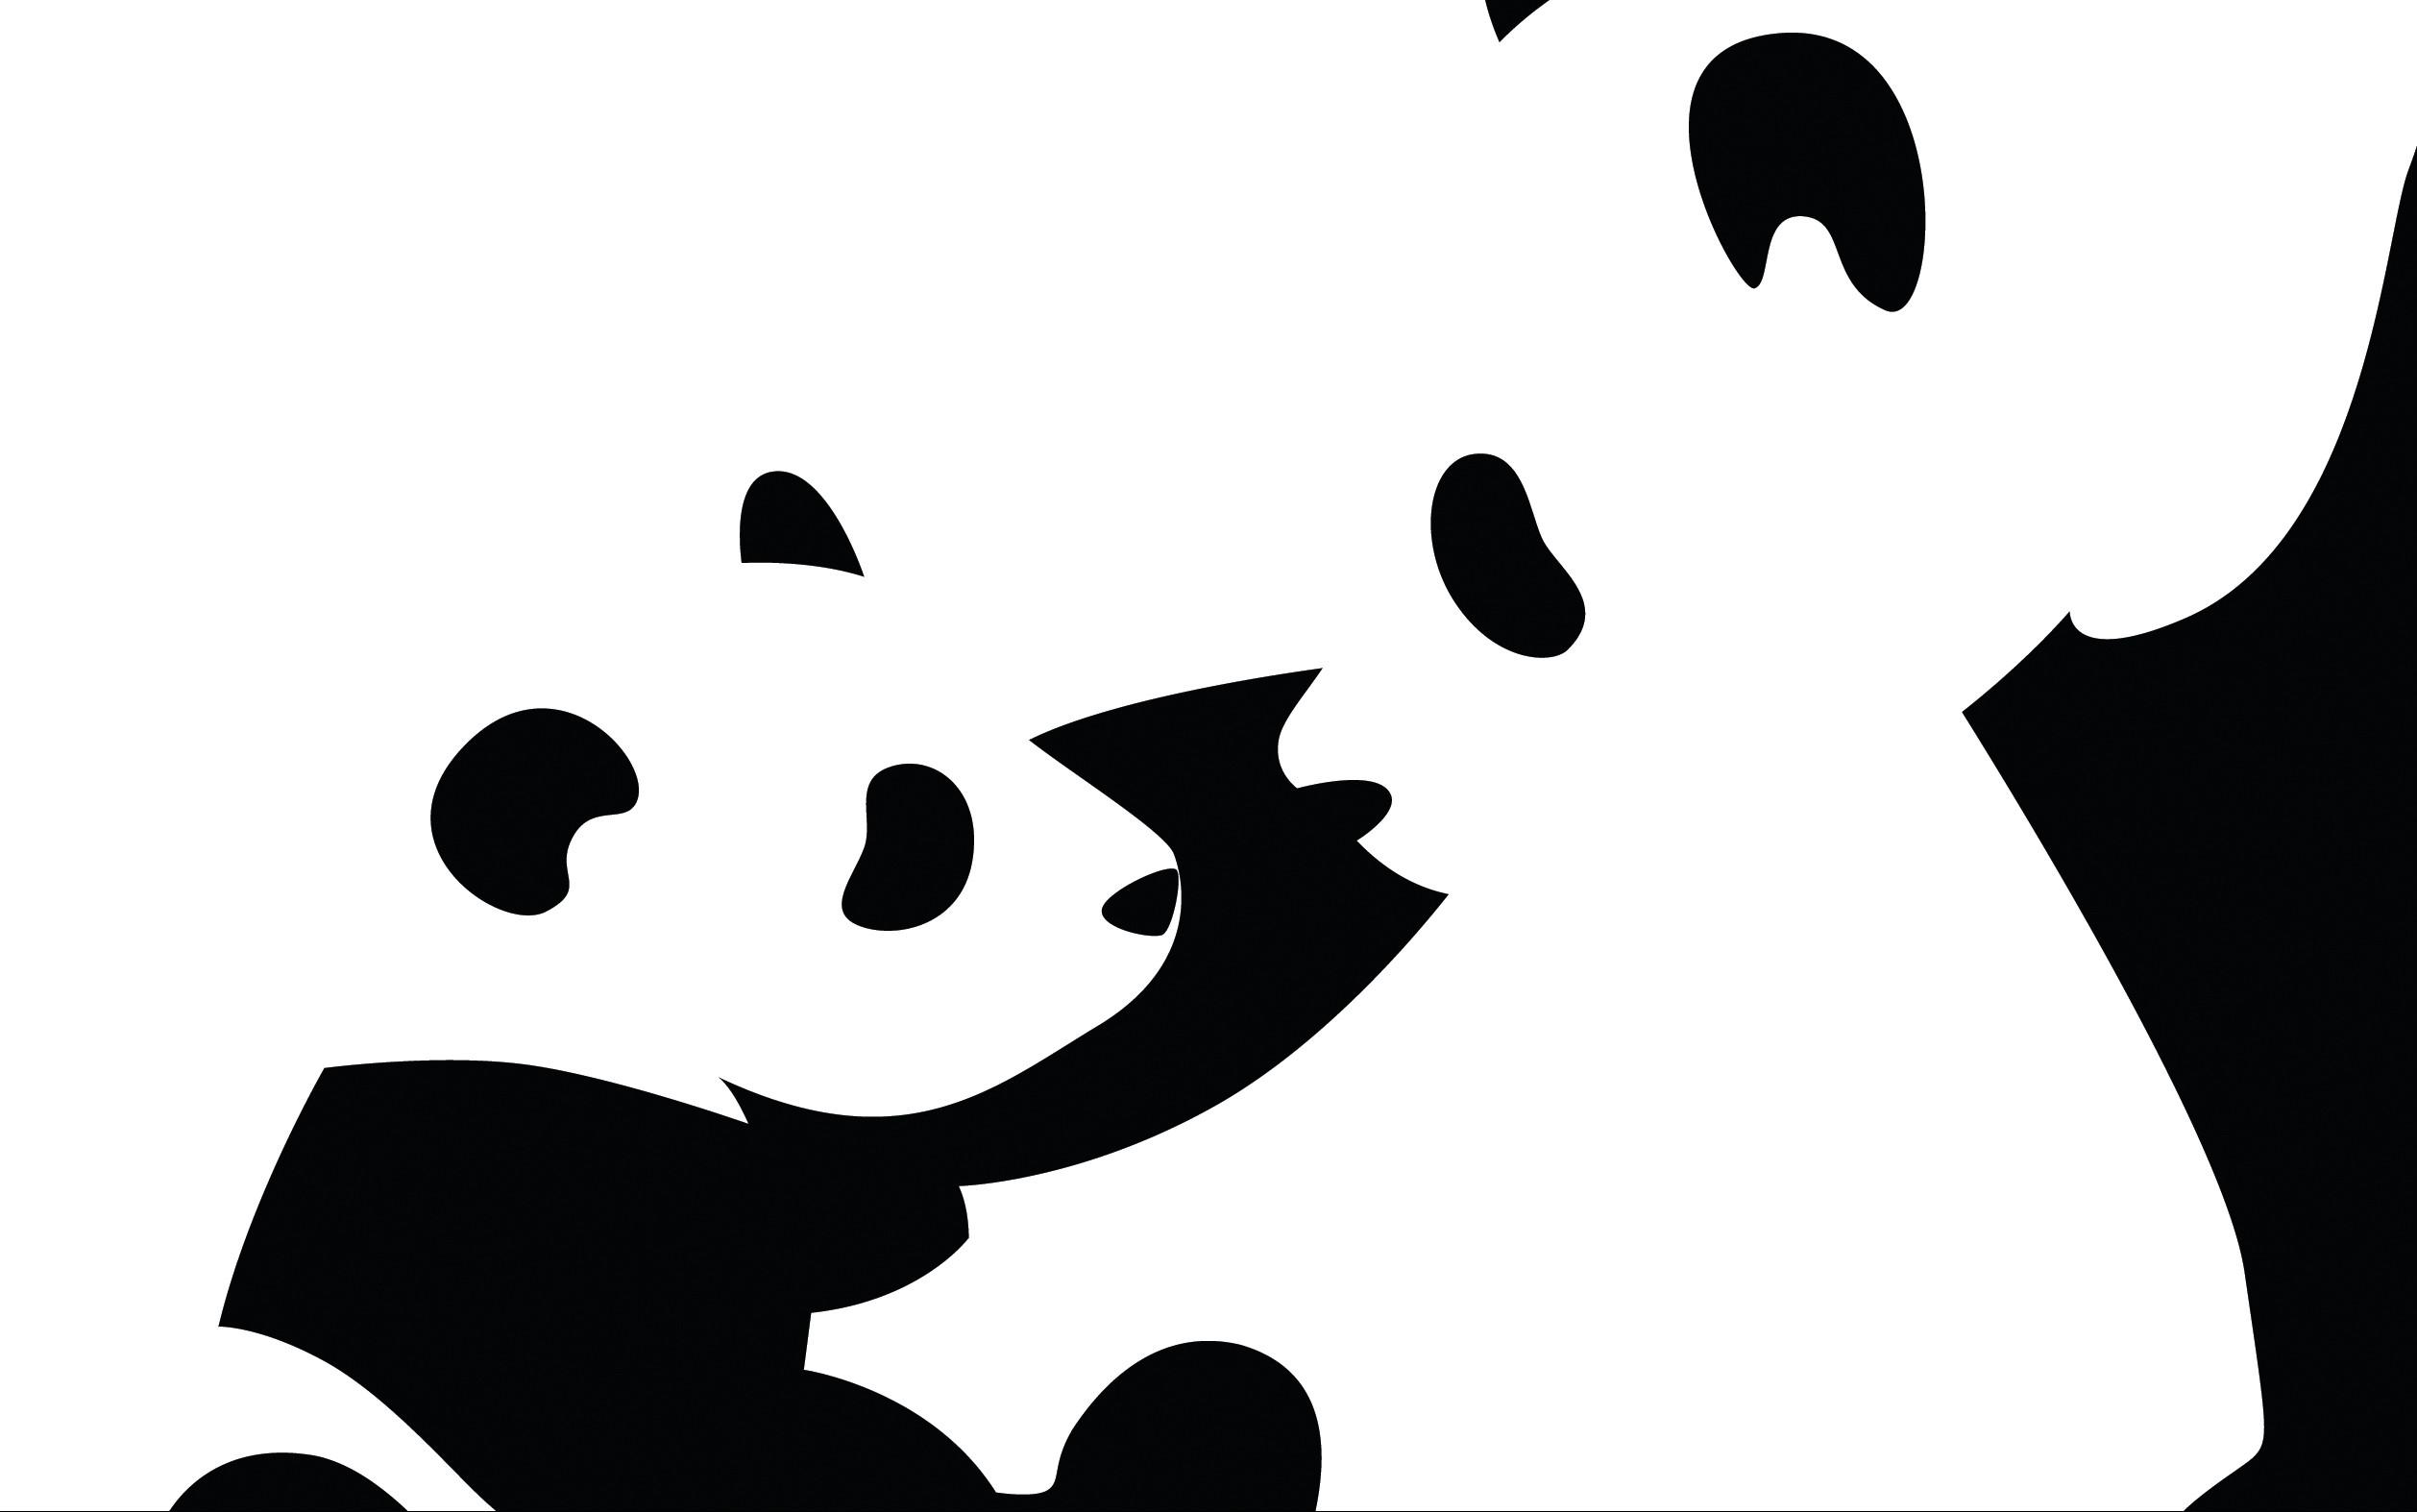 Cute-wallpapers-HD-panda-desktop